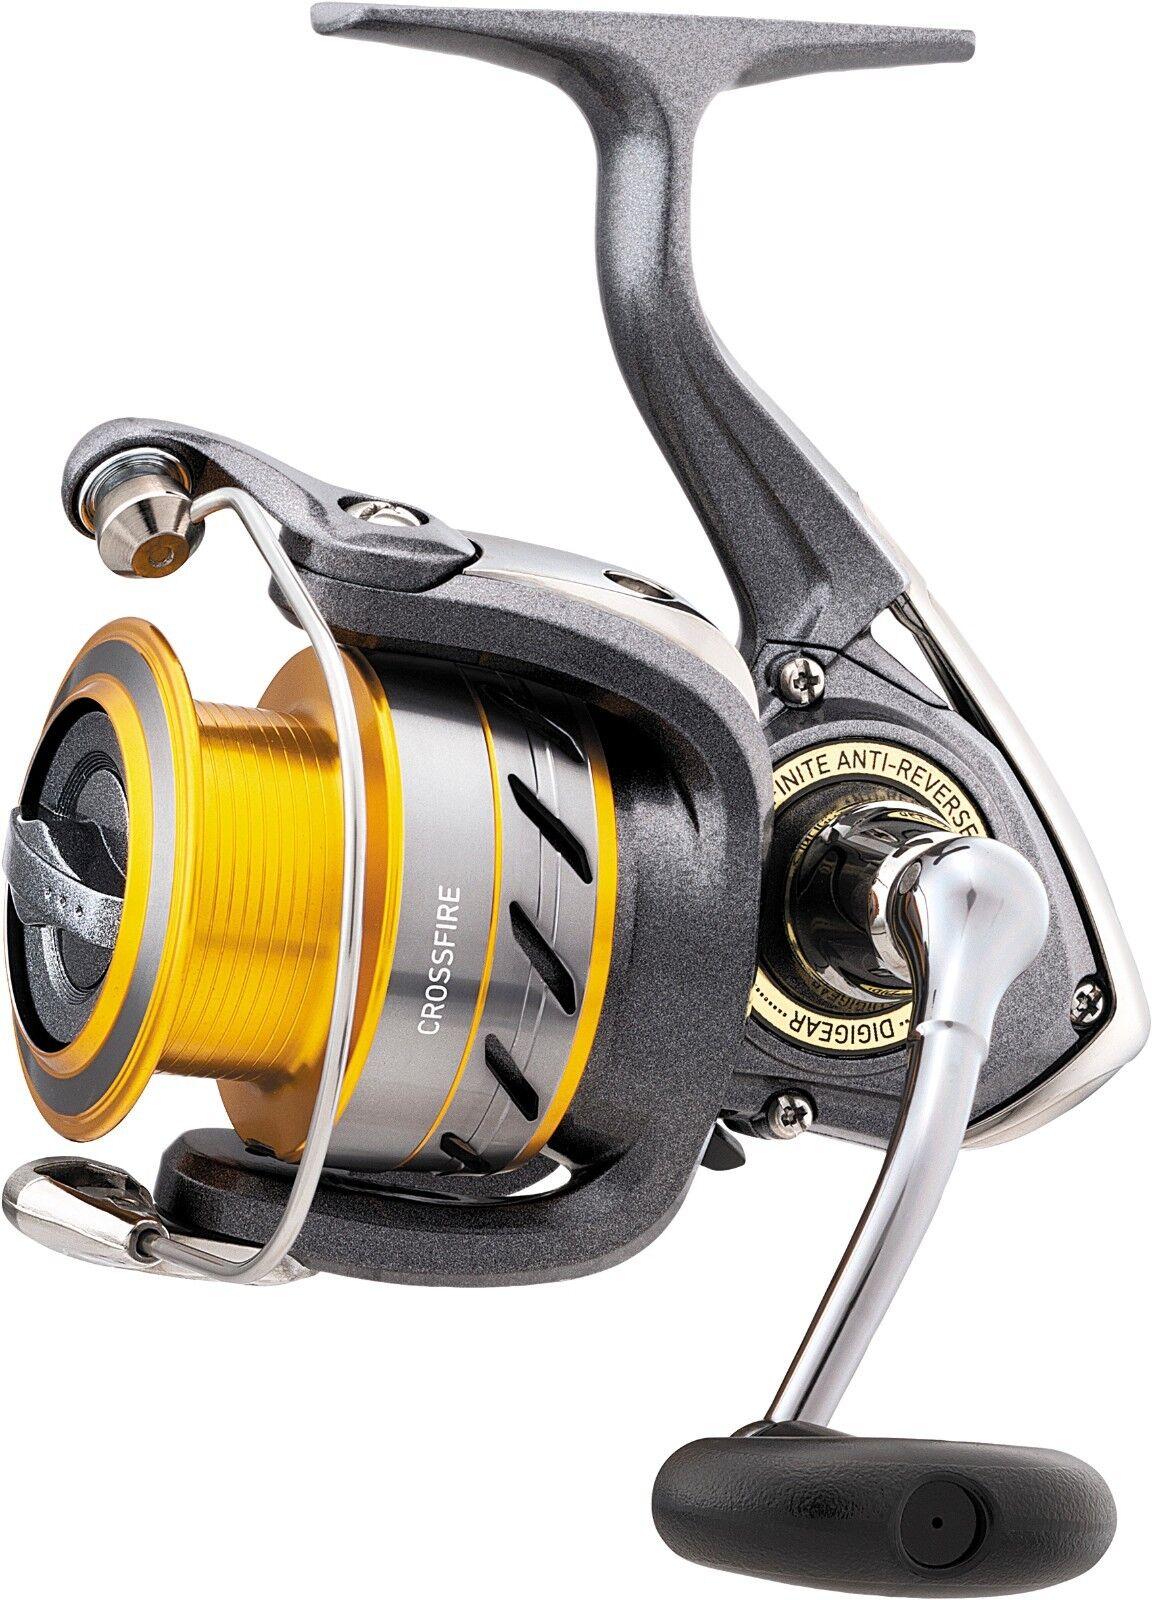 Daiwa Crossfire Coarse Match Feeder Fishing Reel Sizes 2000 2500 3000 4000 5000